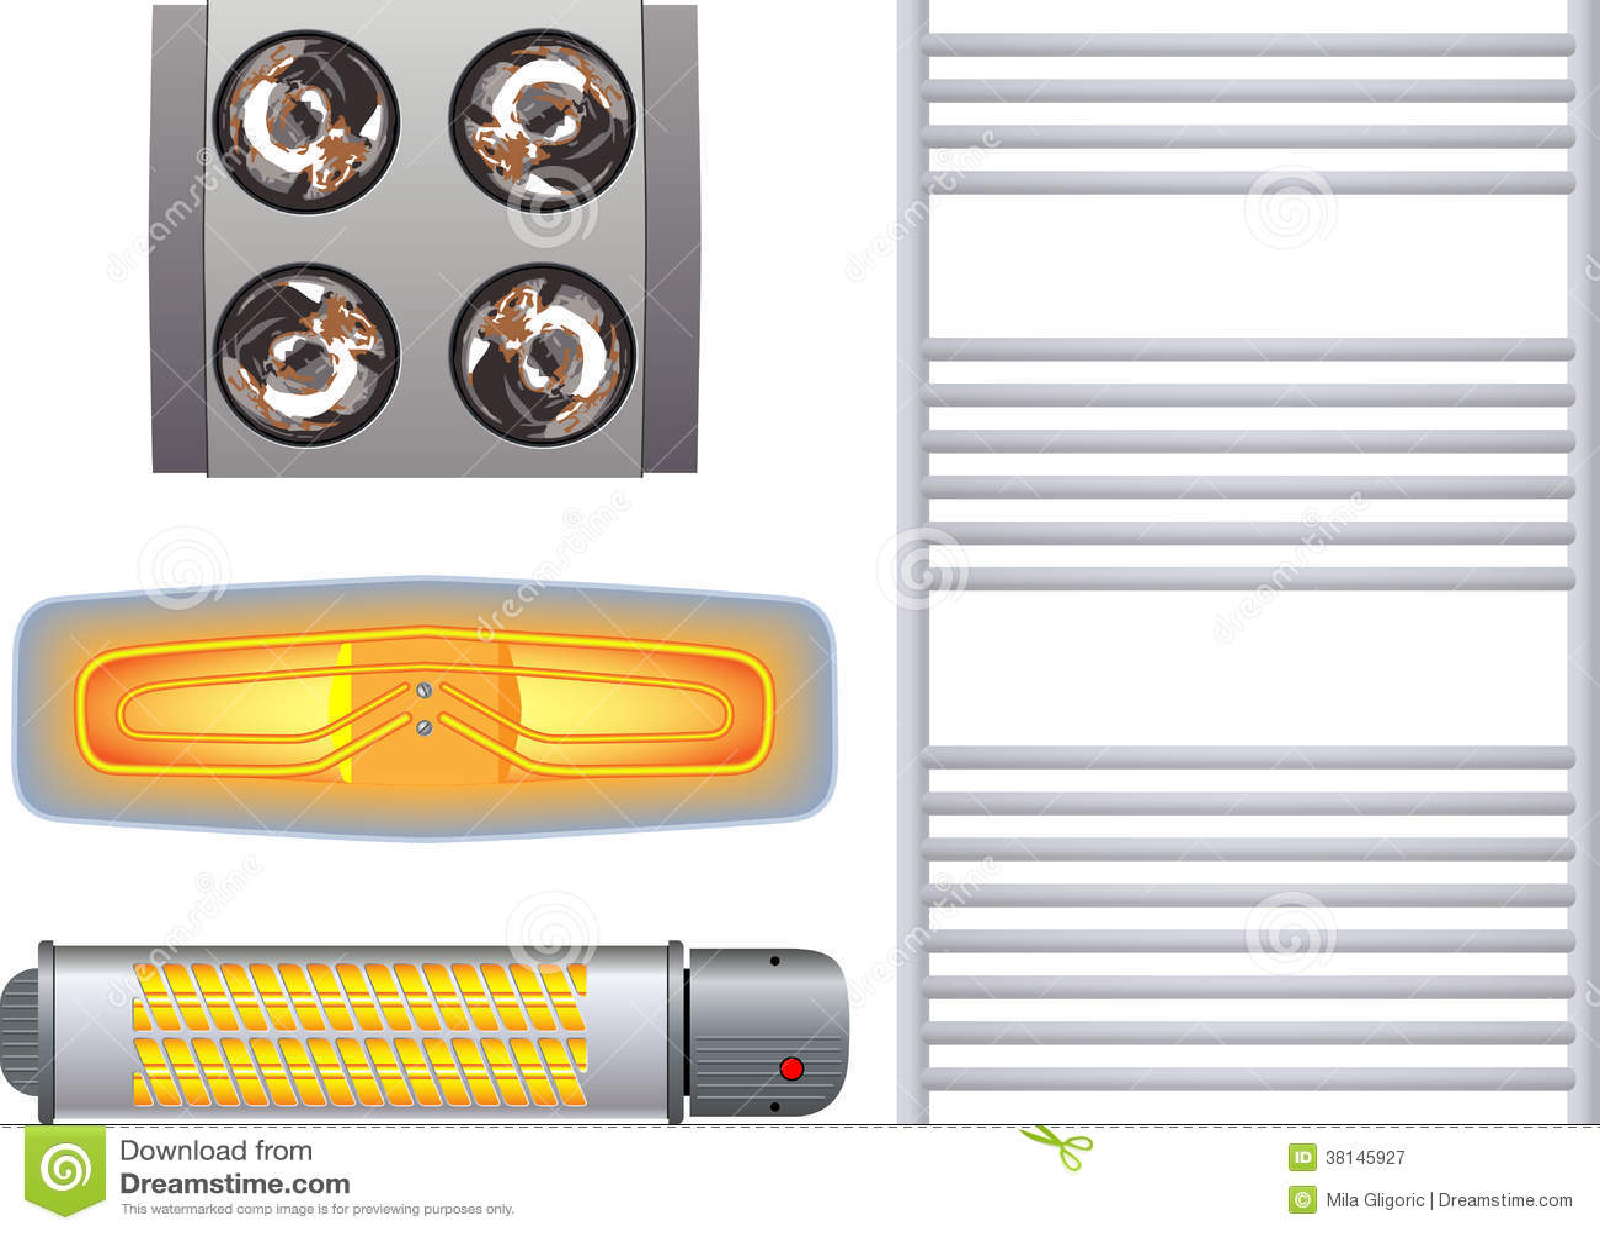 Calentadores Para Cuartos De Bano.Calentador Para El Cuarto De Bano Imagen De Archivo Imagen